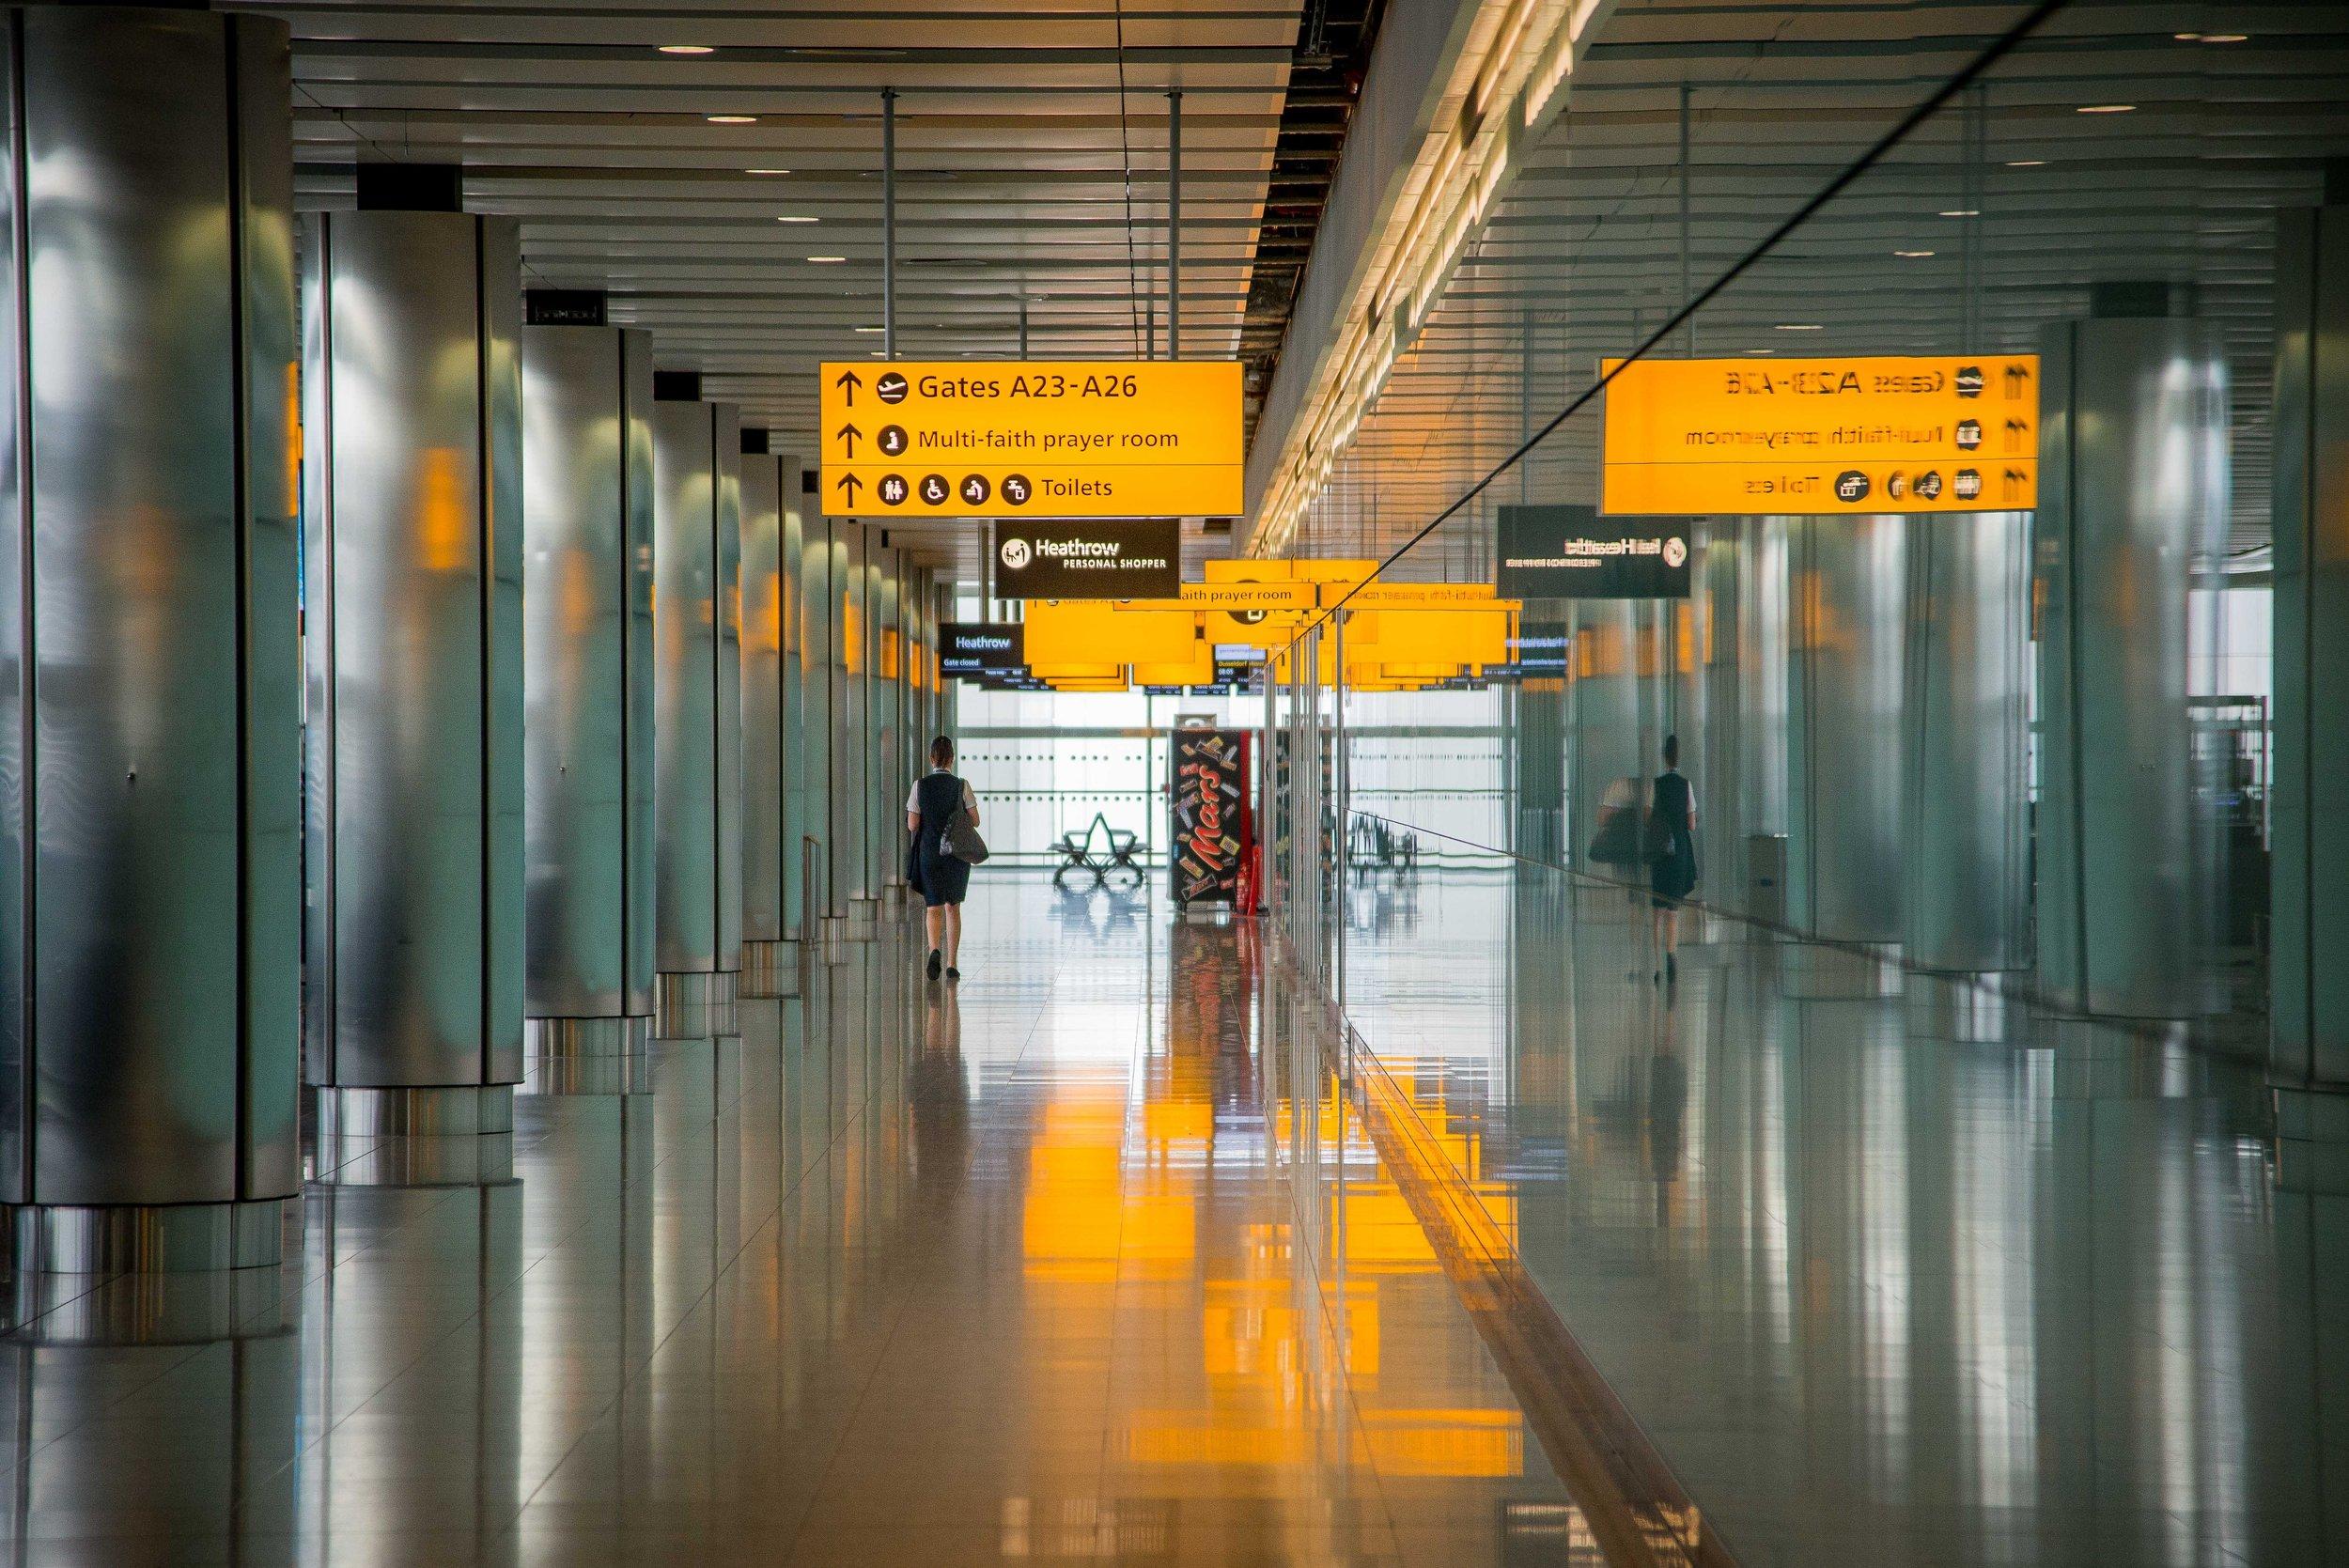 pro-image-photography-129310 airport uk.jpg